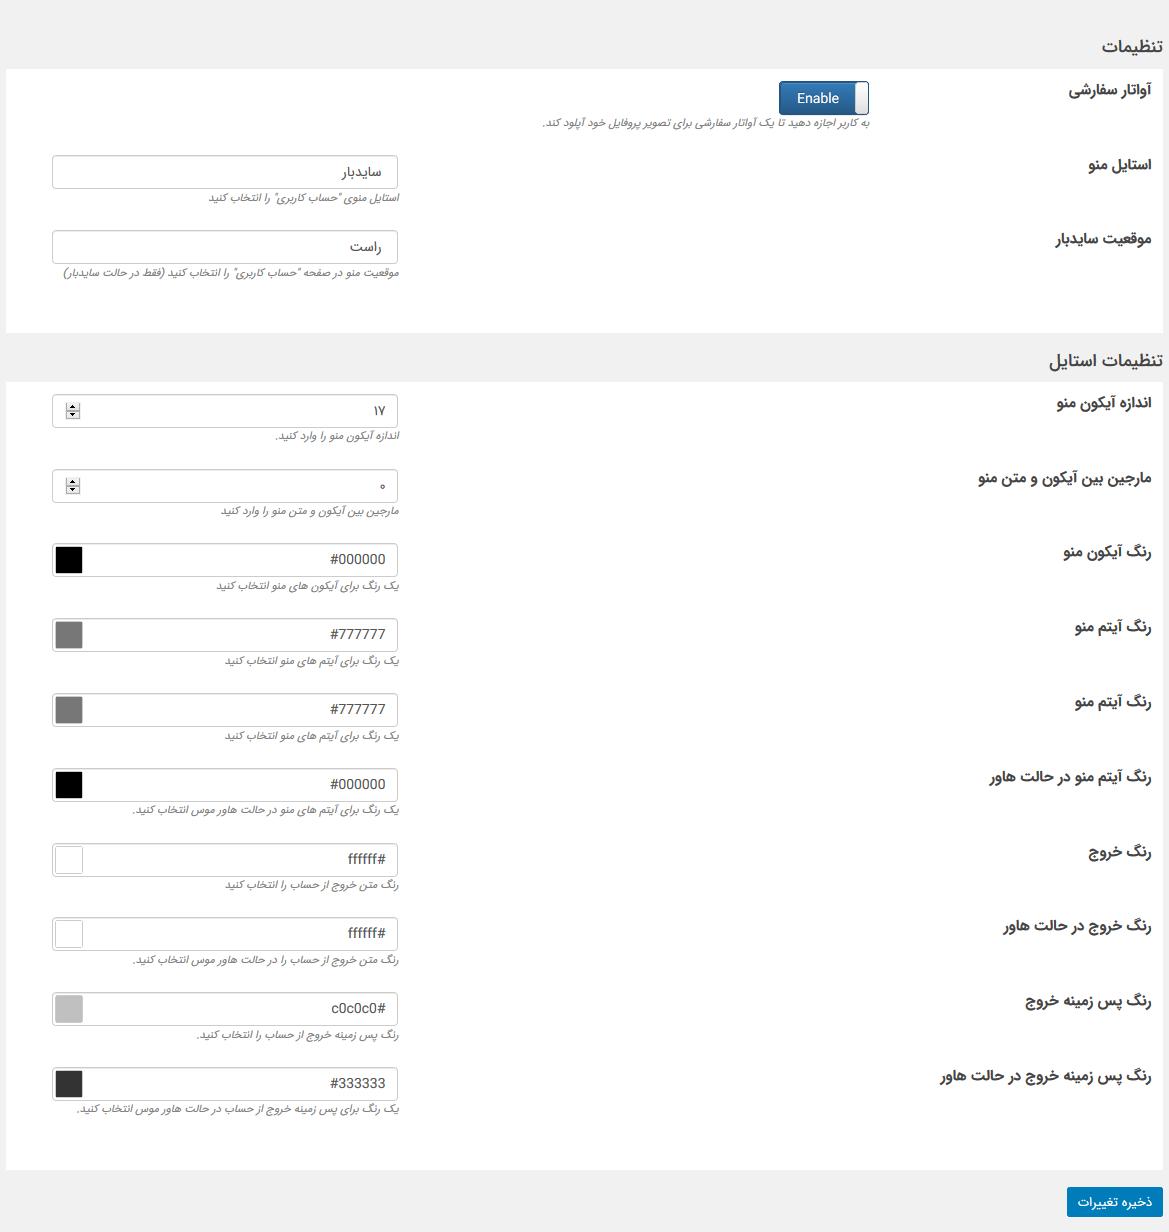 افزونه ویرایشگر حساب کاربری ووکامرس | Custom My Account Dashboard for WooCommerce